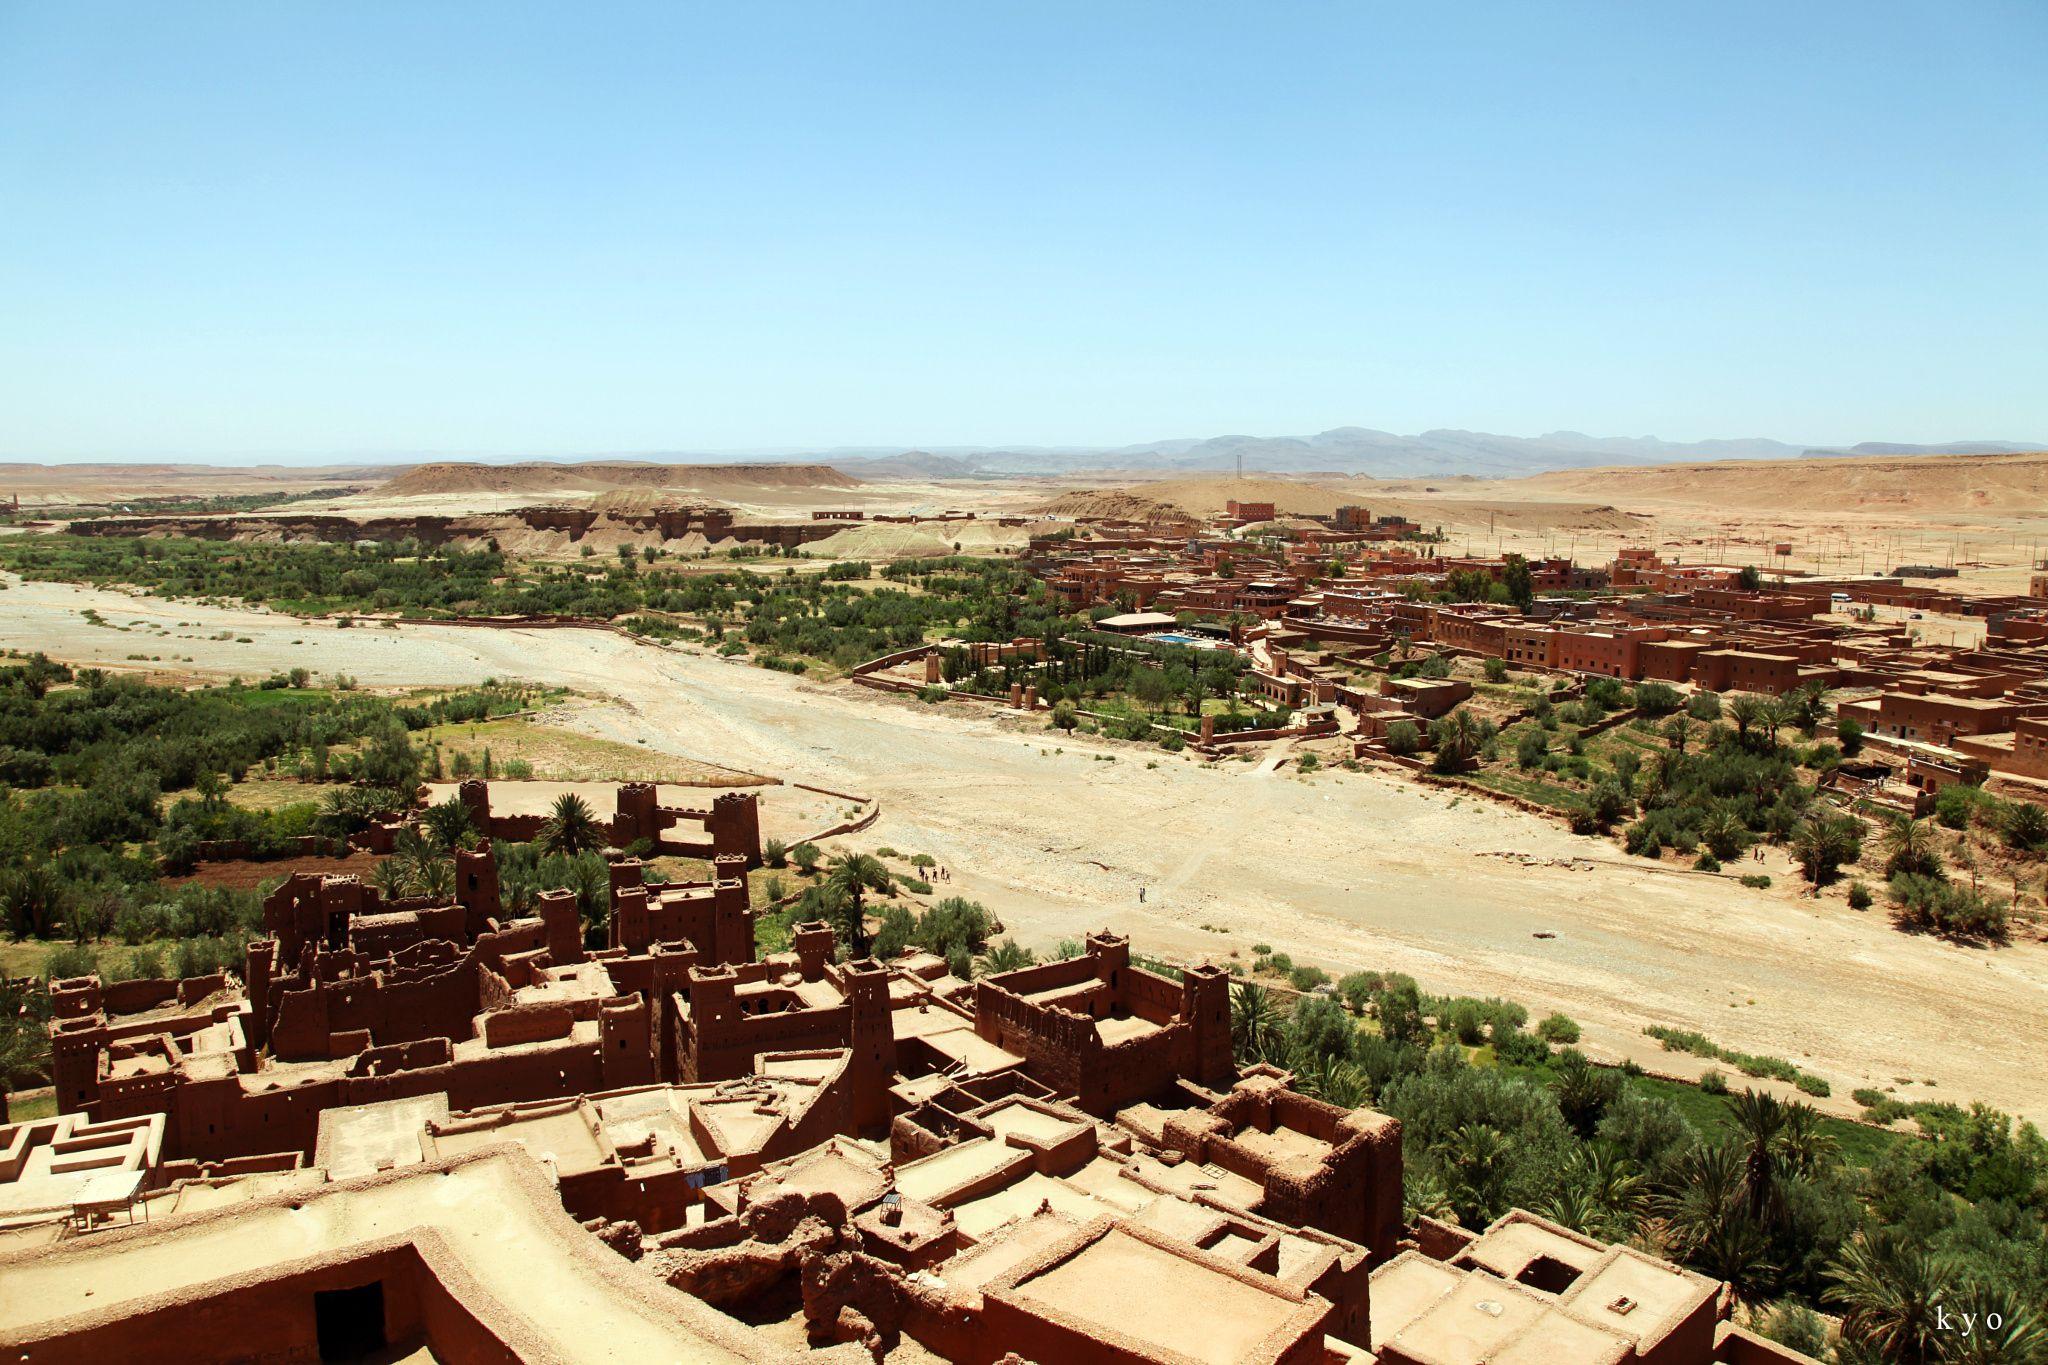 Morocco #37 - #37: Kasbah Tebi in Aït Ben Haddou, Morocco